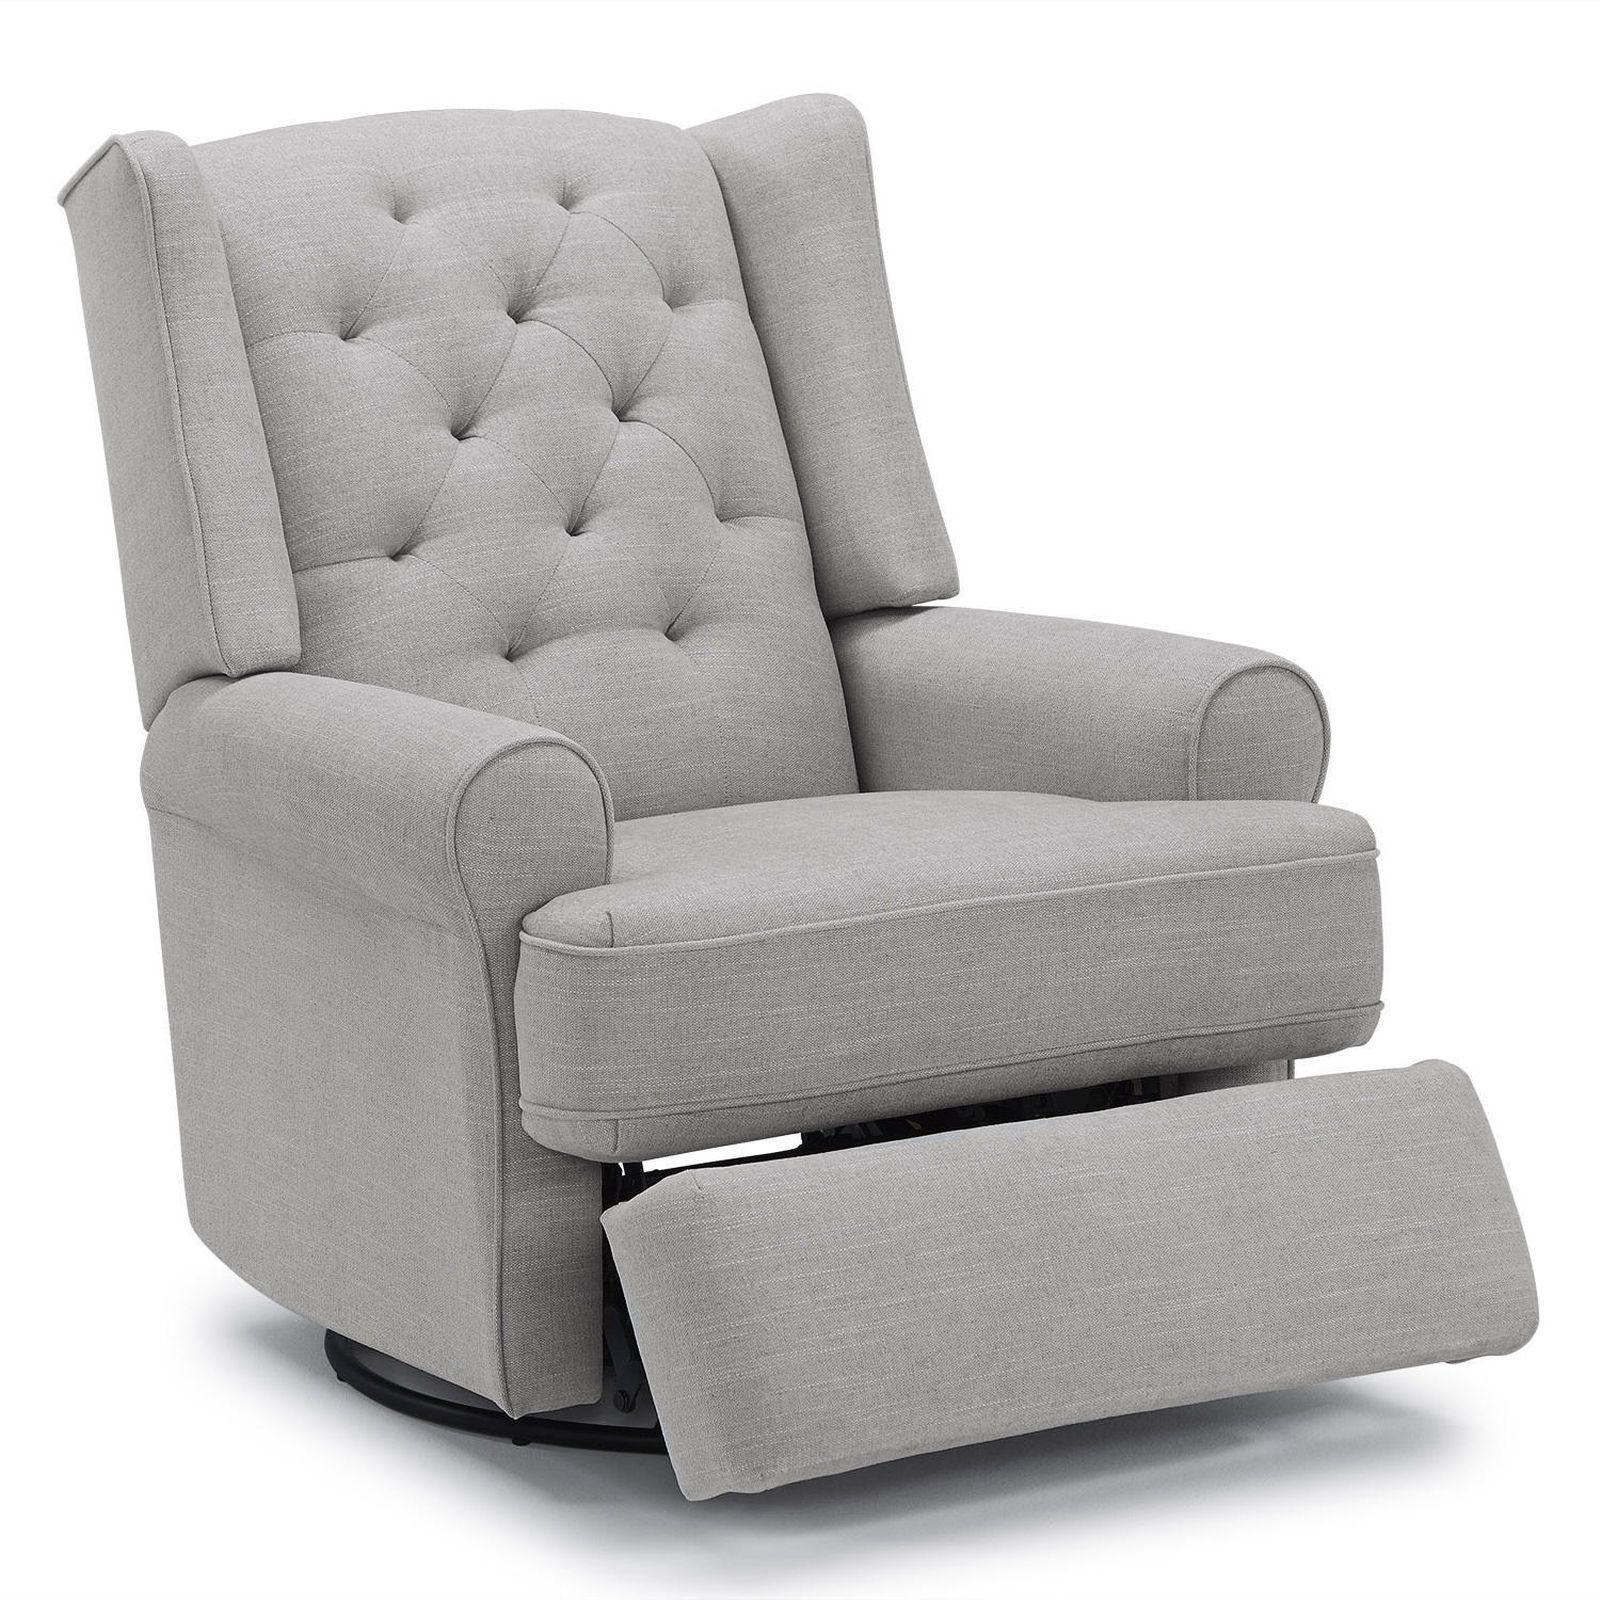 Best Chairs Finley Swivel Glider Recliner Gray Tweed Reclining